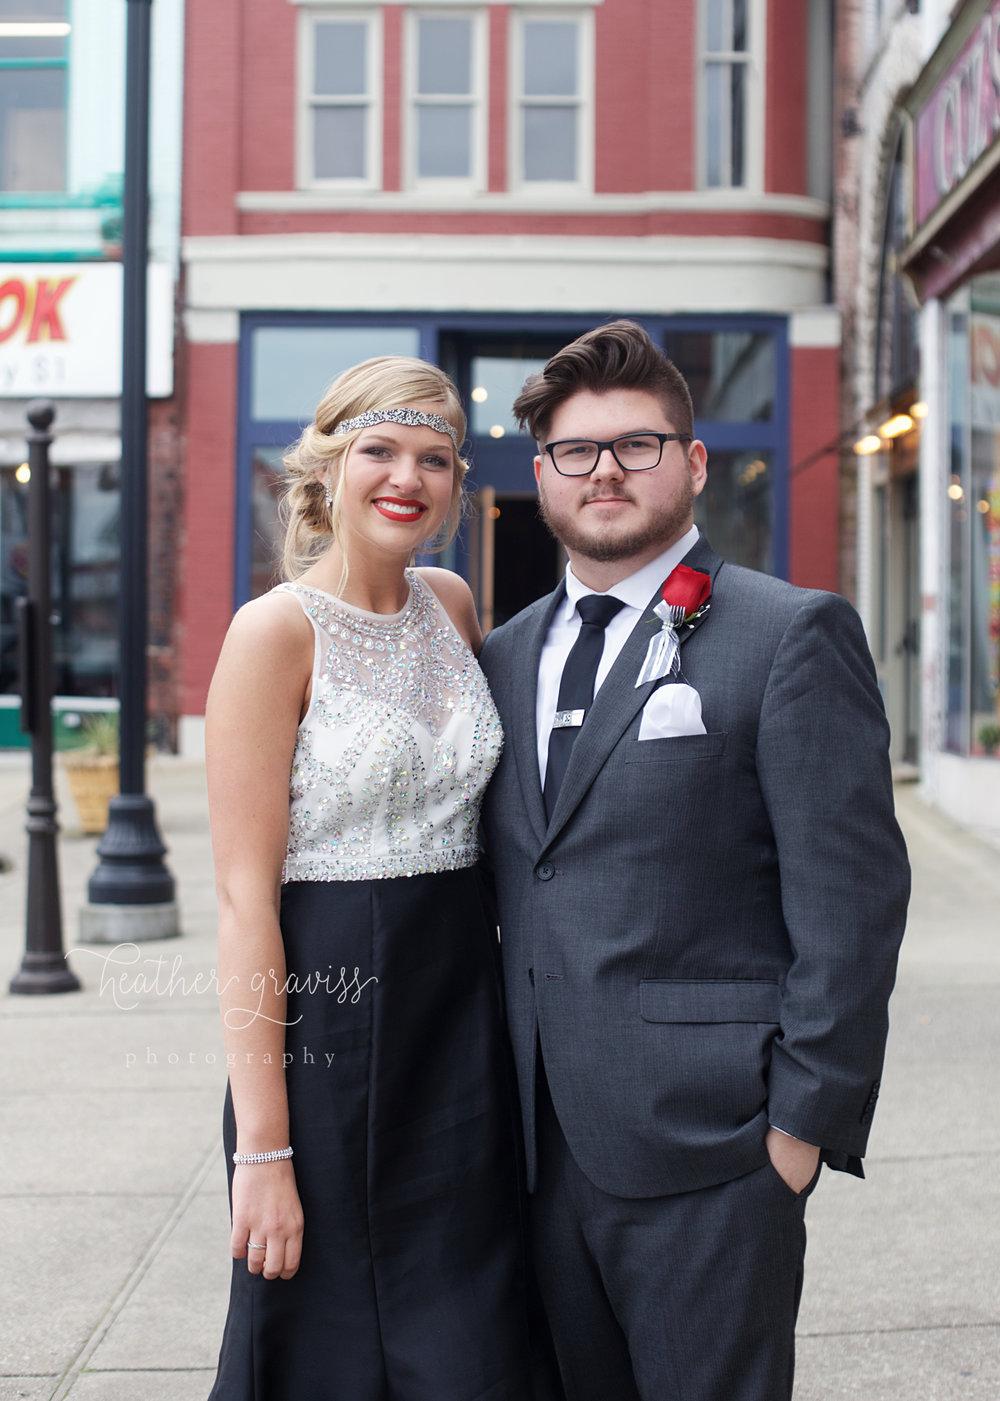 prom-couple.jpg